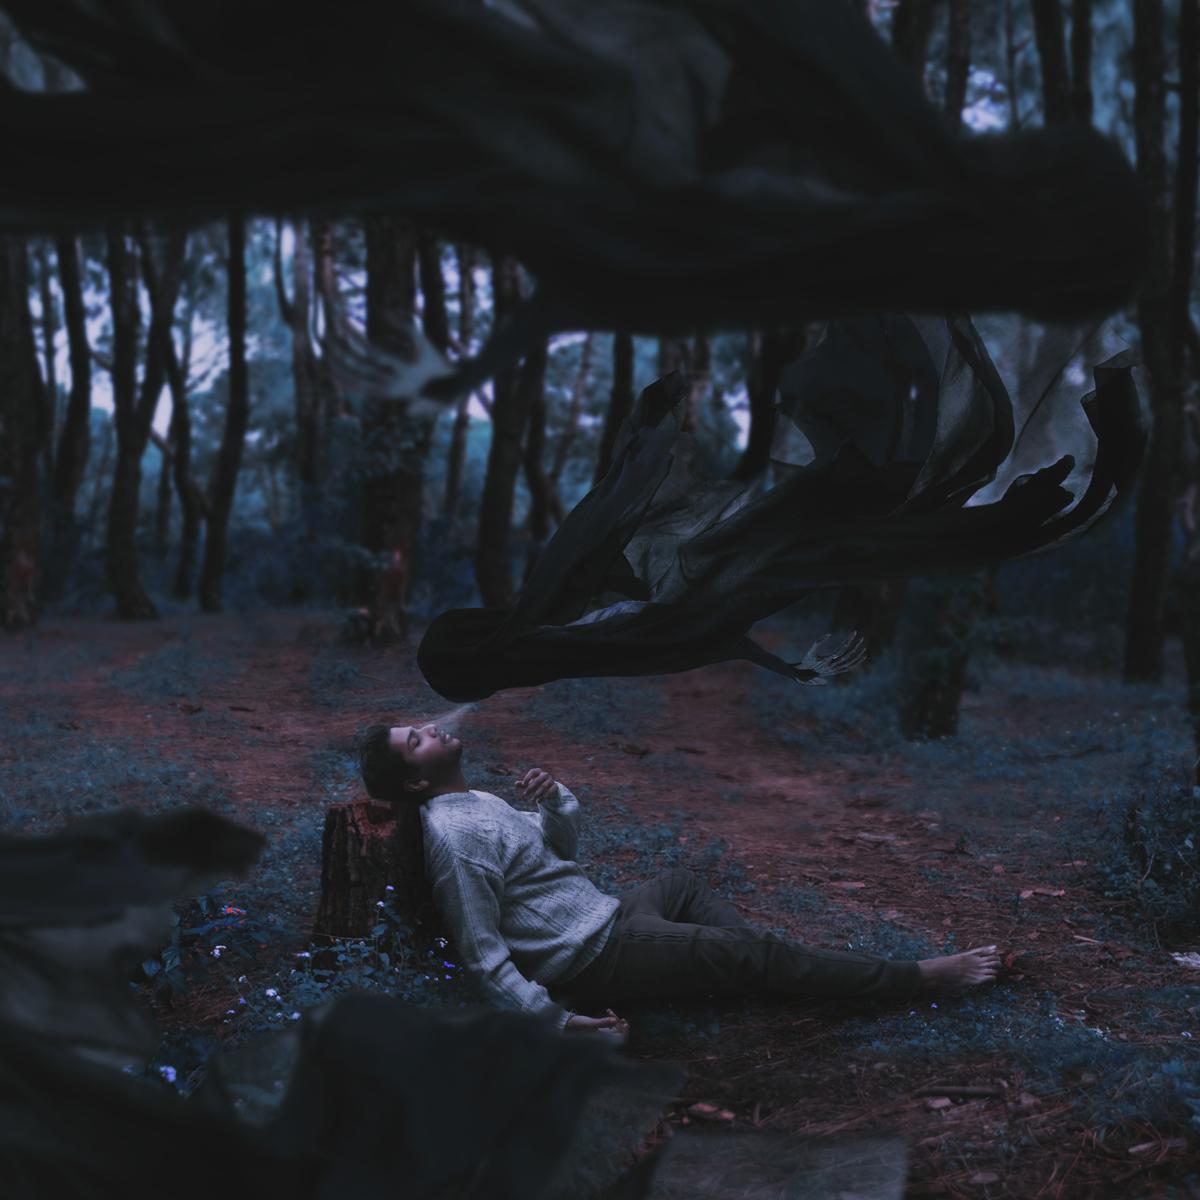 Naman Verma - The Dementor's Kiss